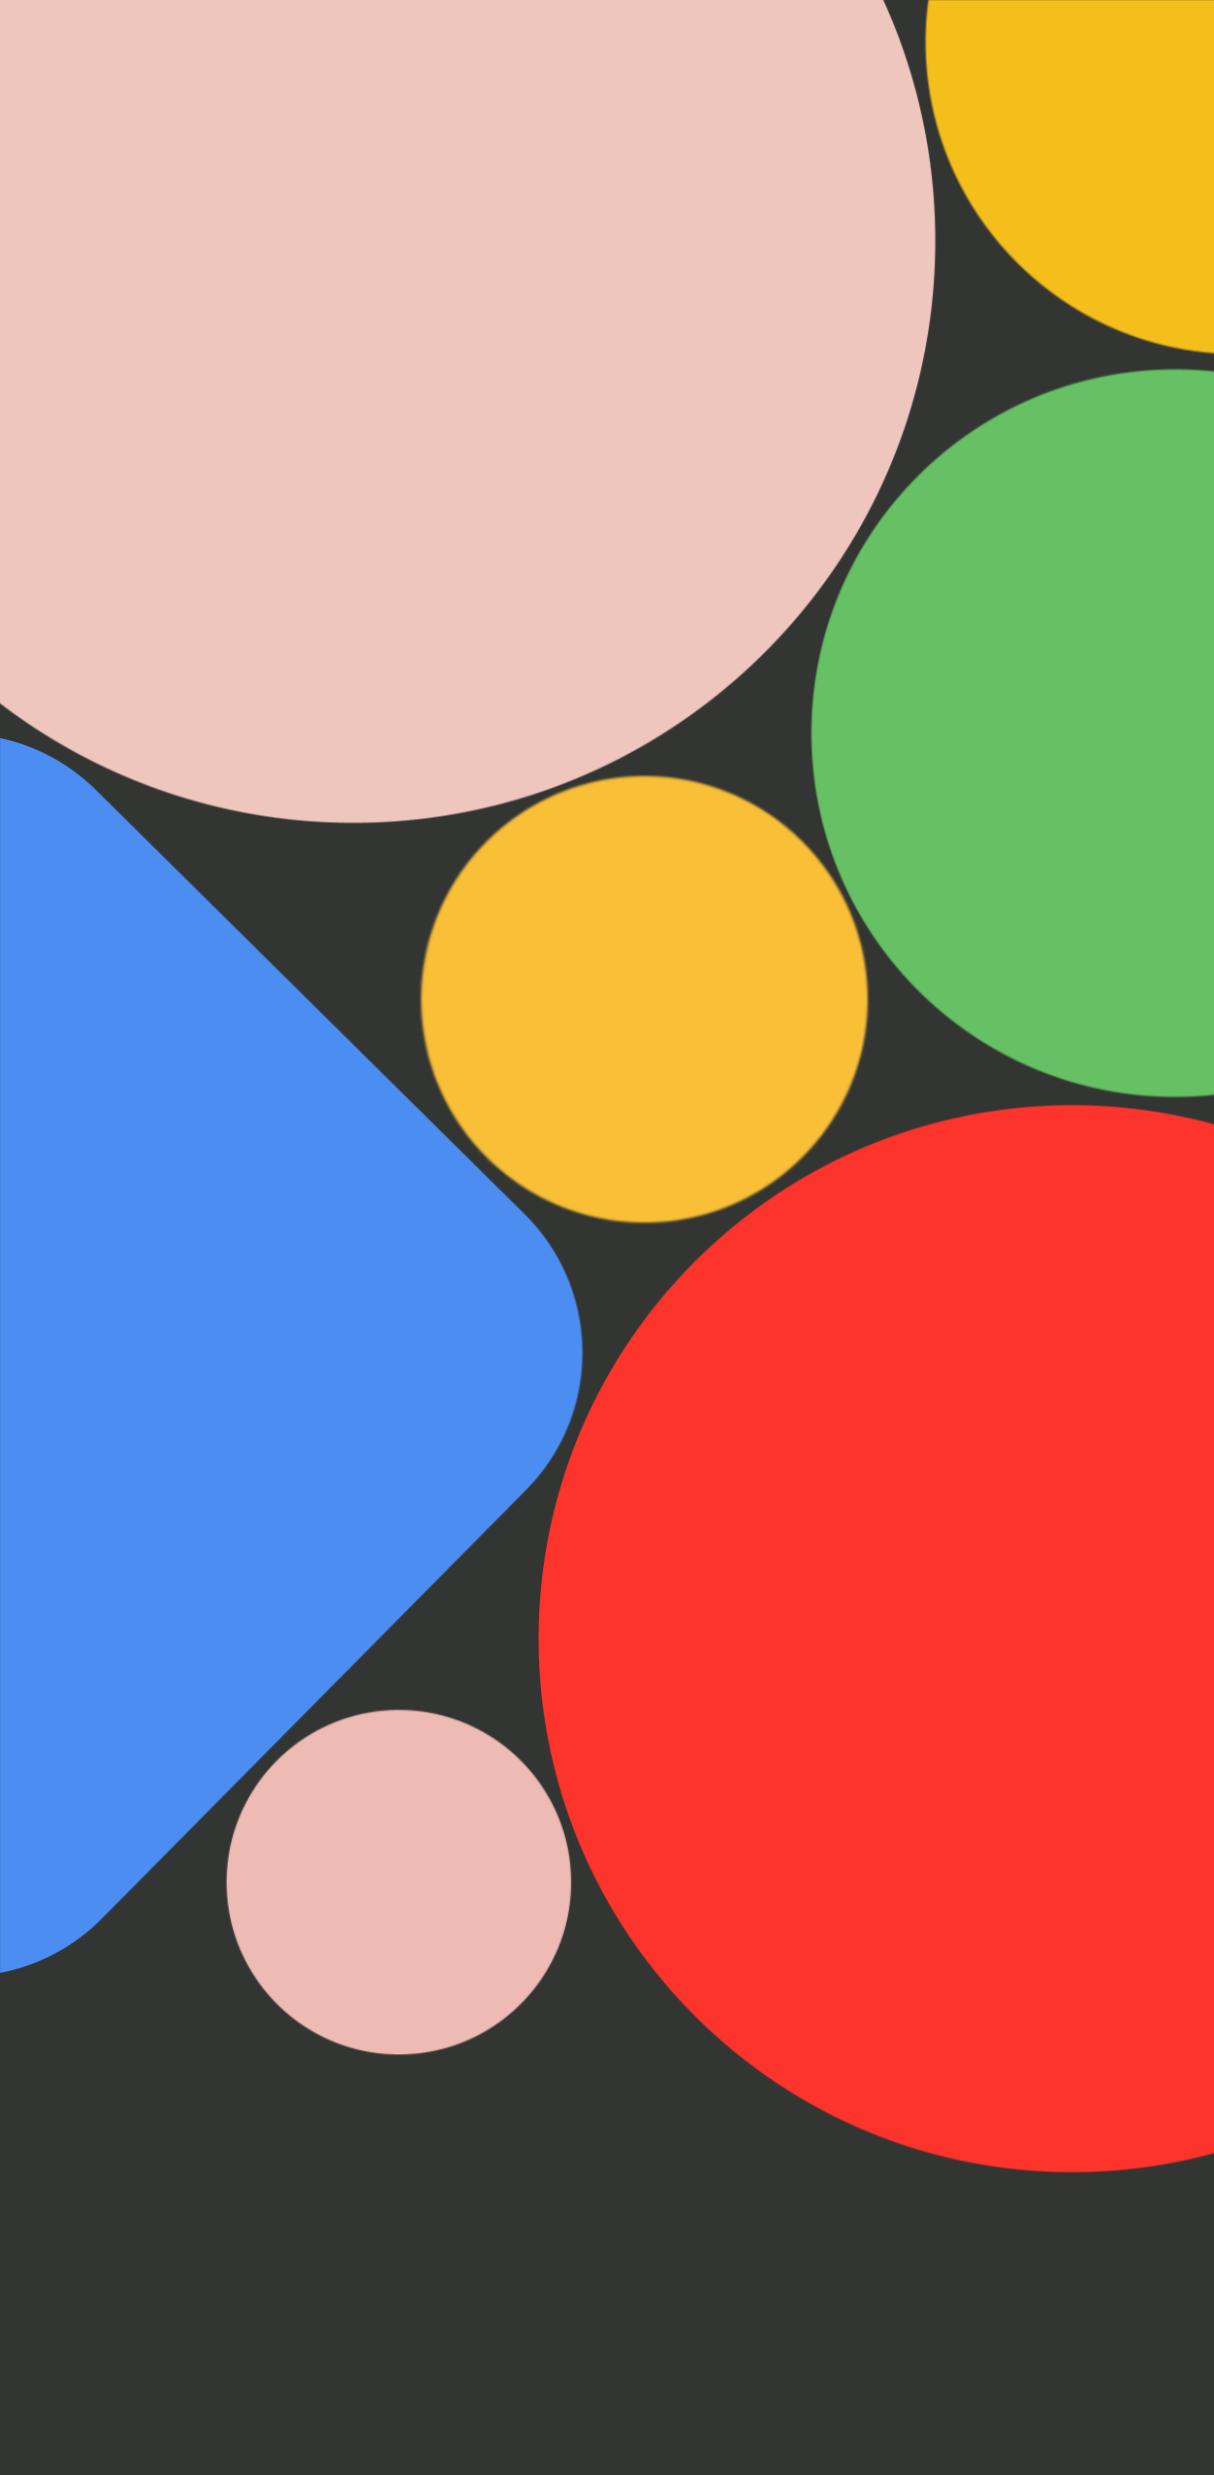 Pixel 4a Wallpaper In 2020 Google Pixel Wallpaper Google Pixel Stock Wallpaper